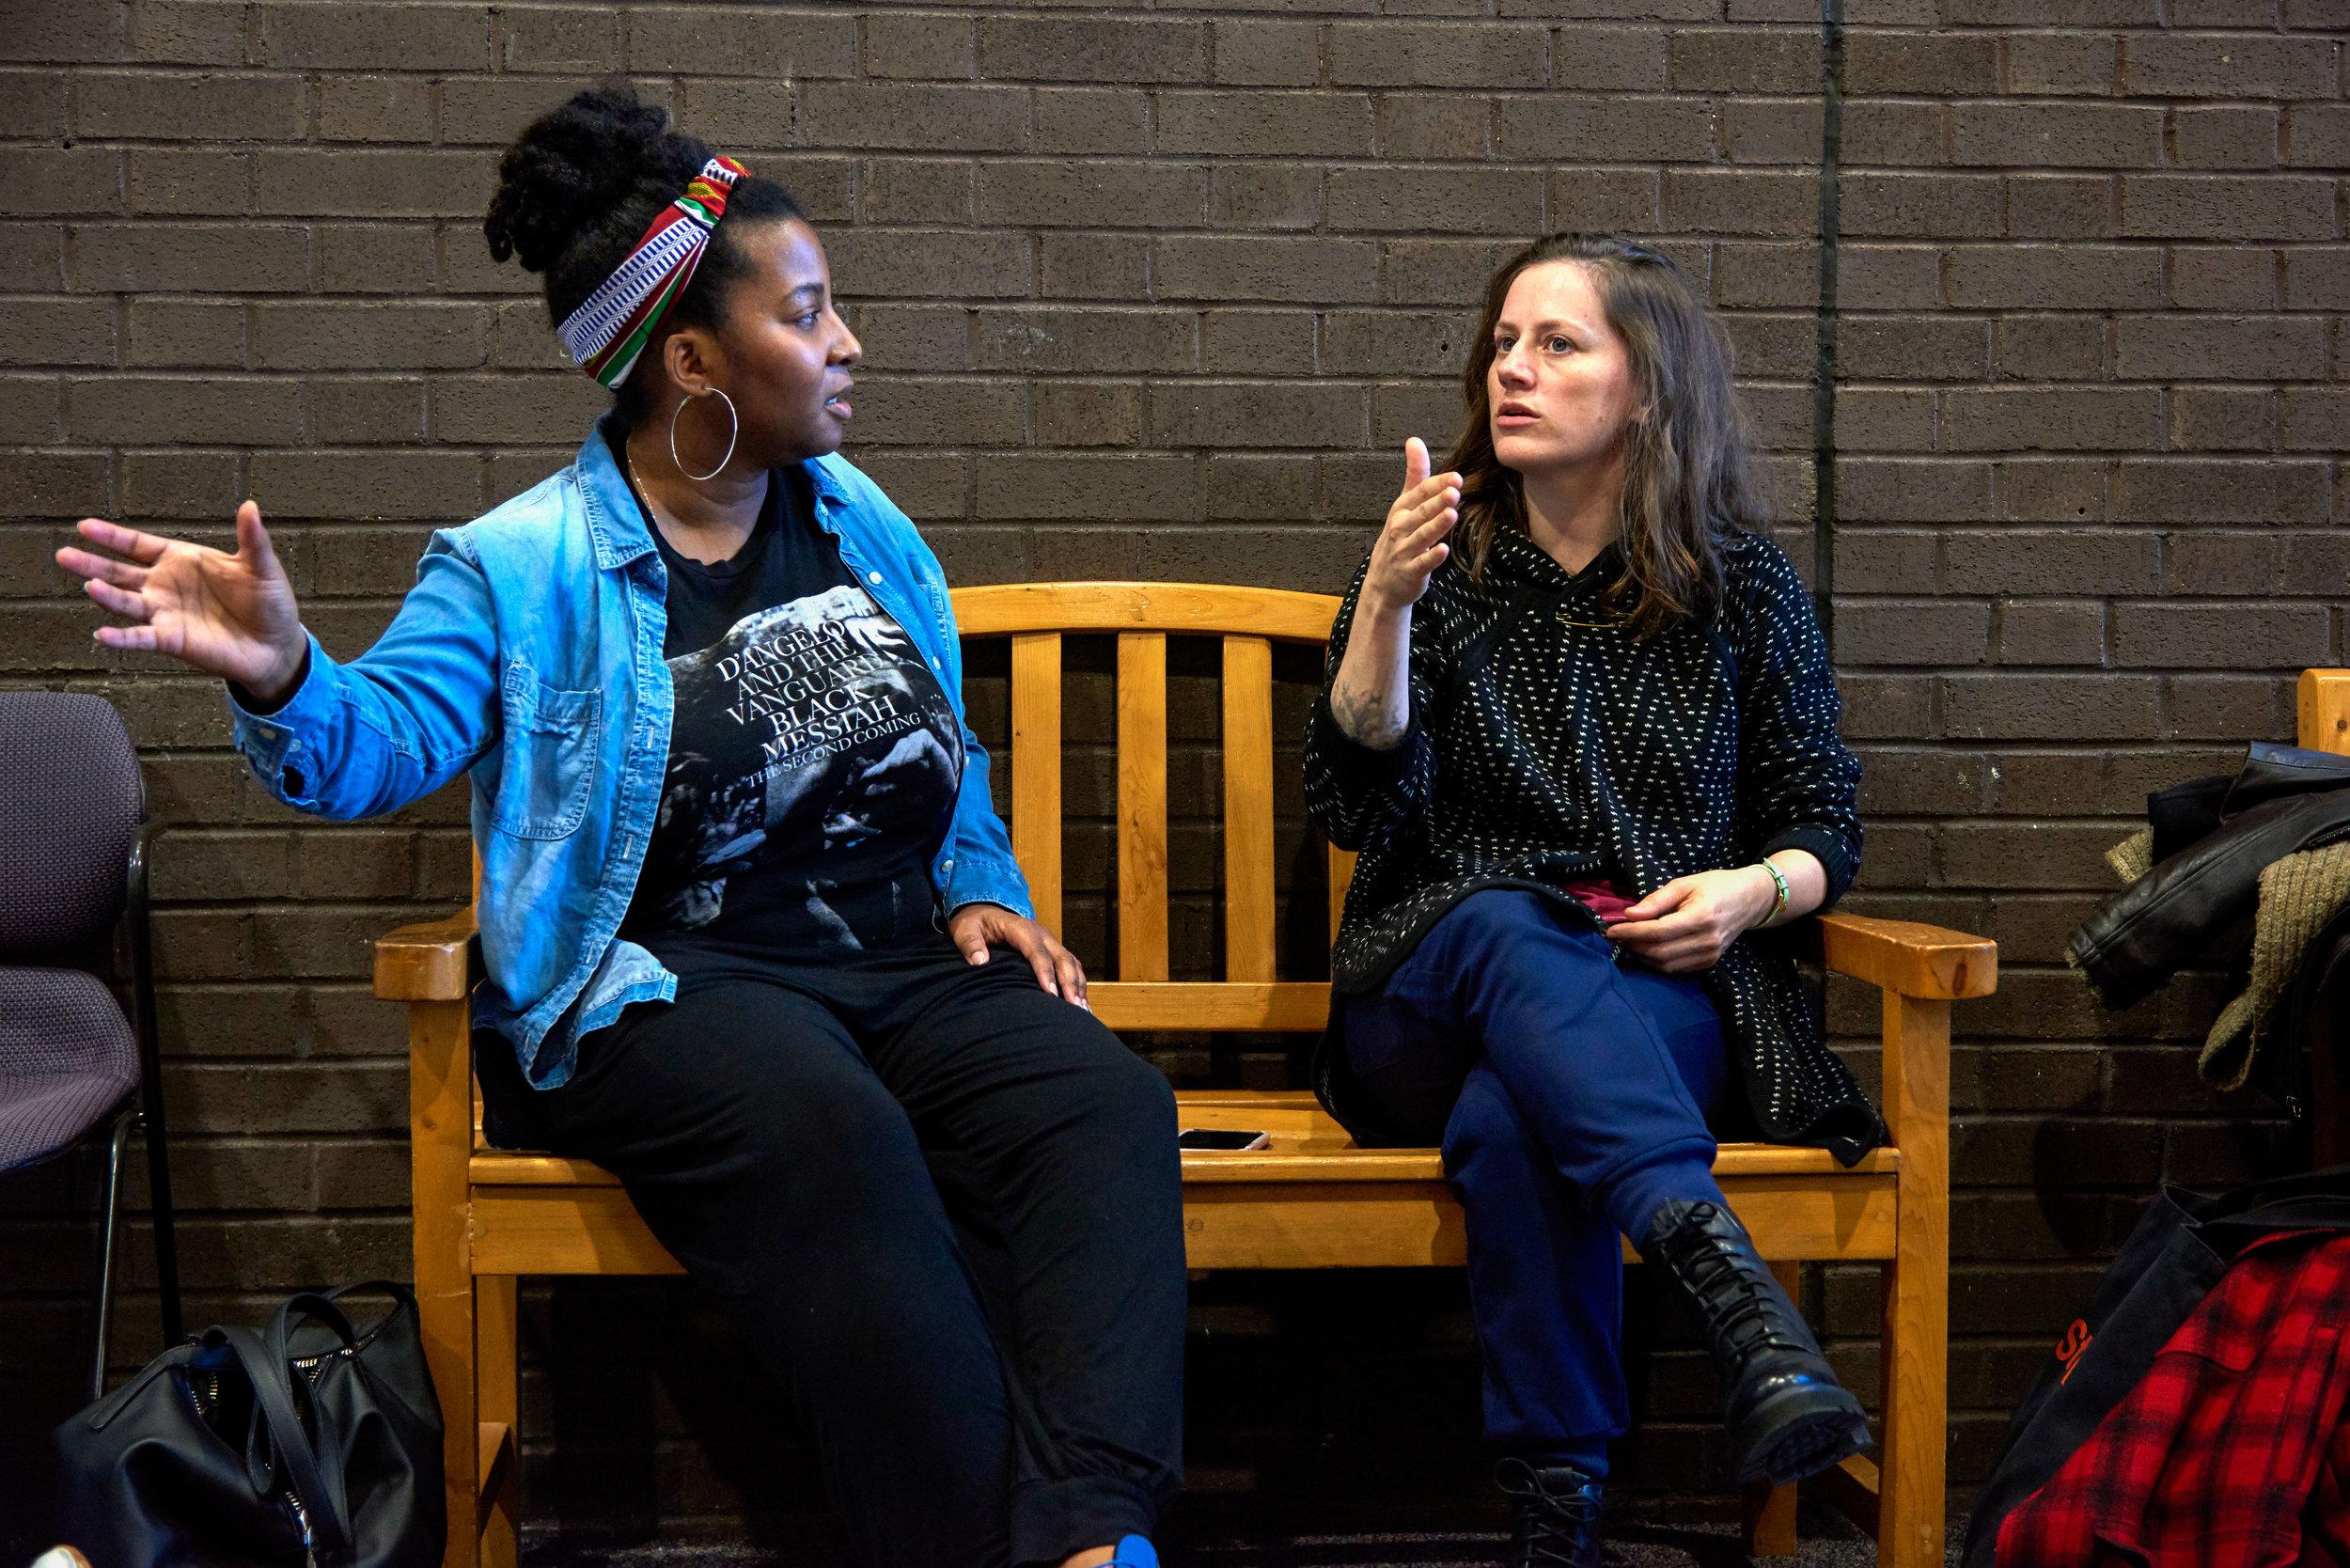 Melanie in rehearsal with Helen Simoneau. Photo by Kate Enman.